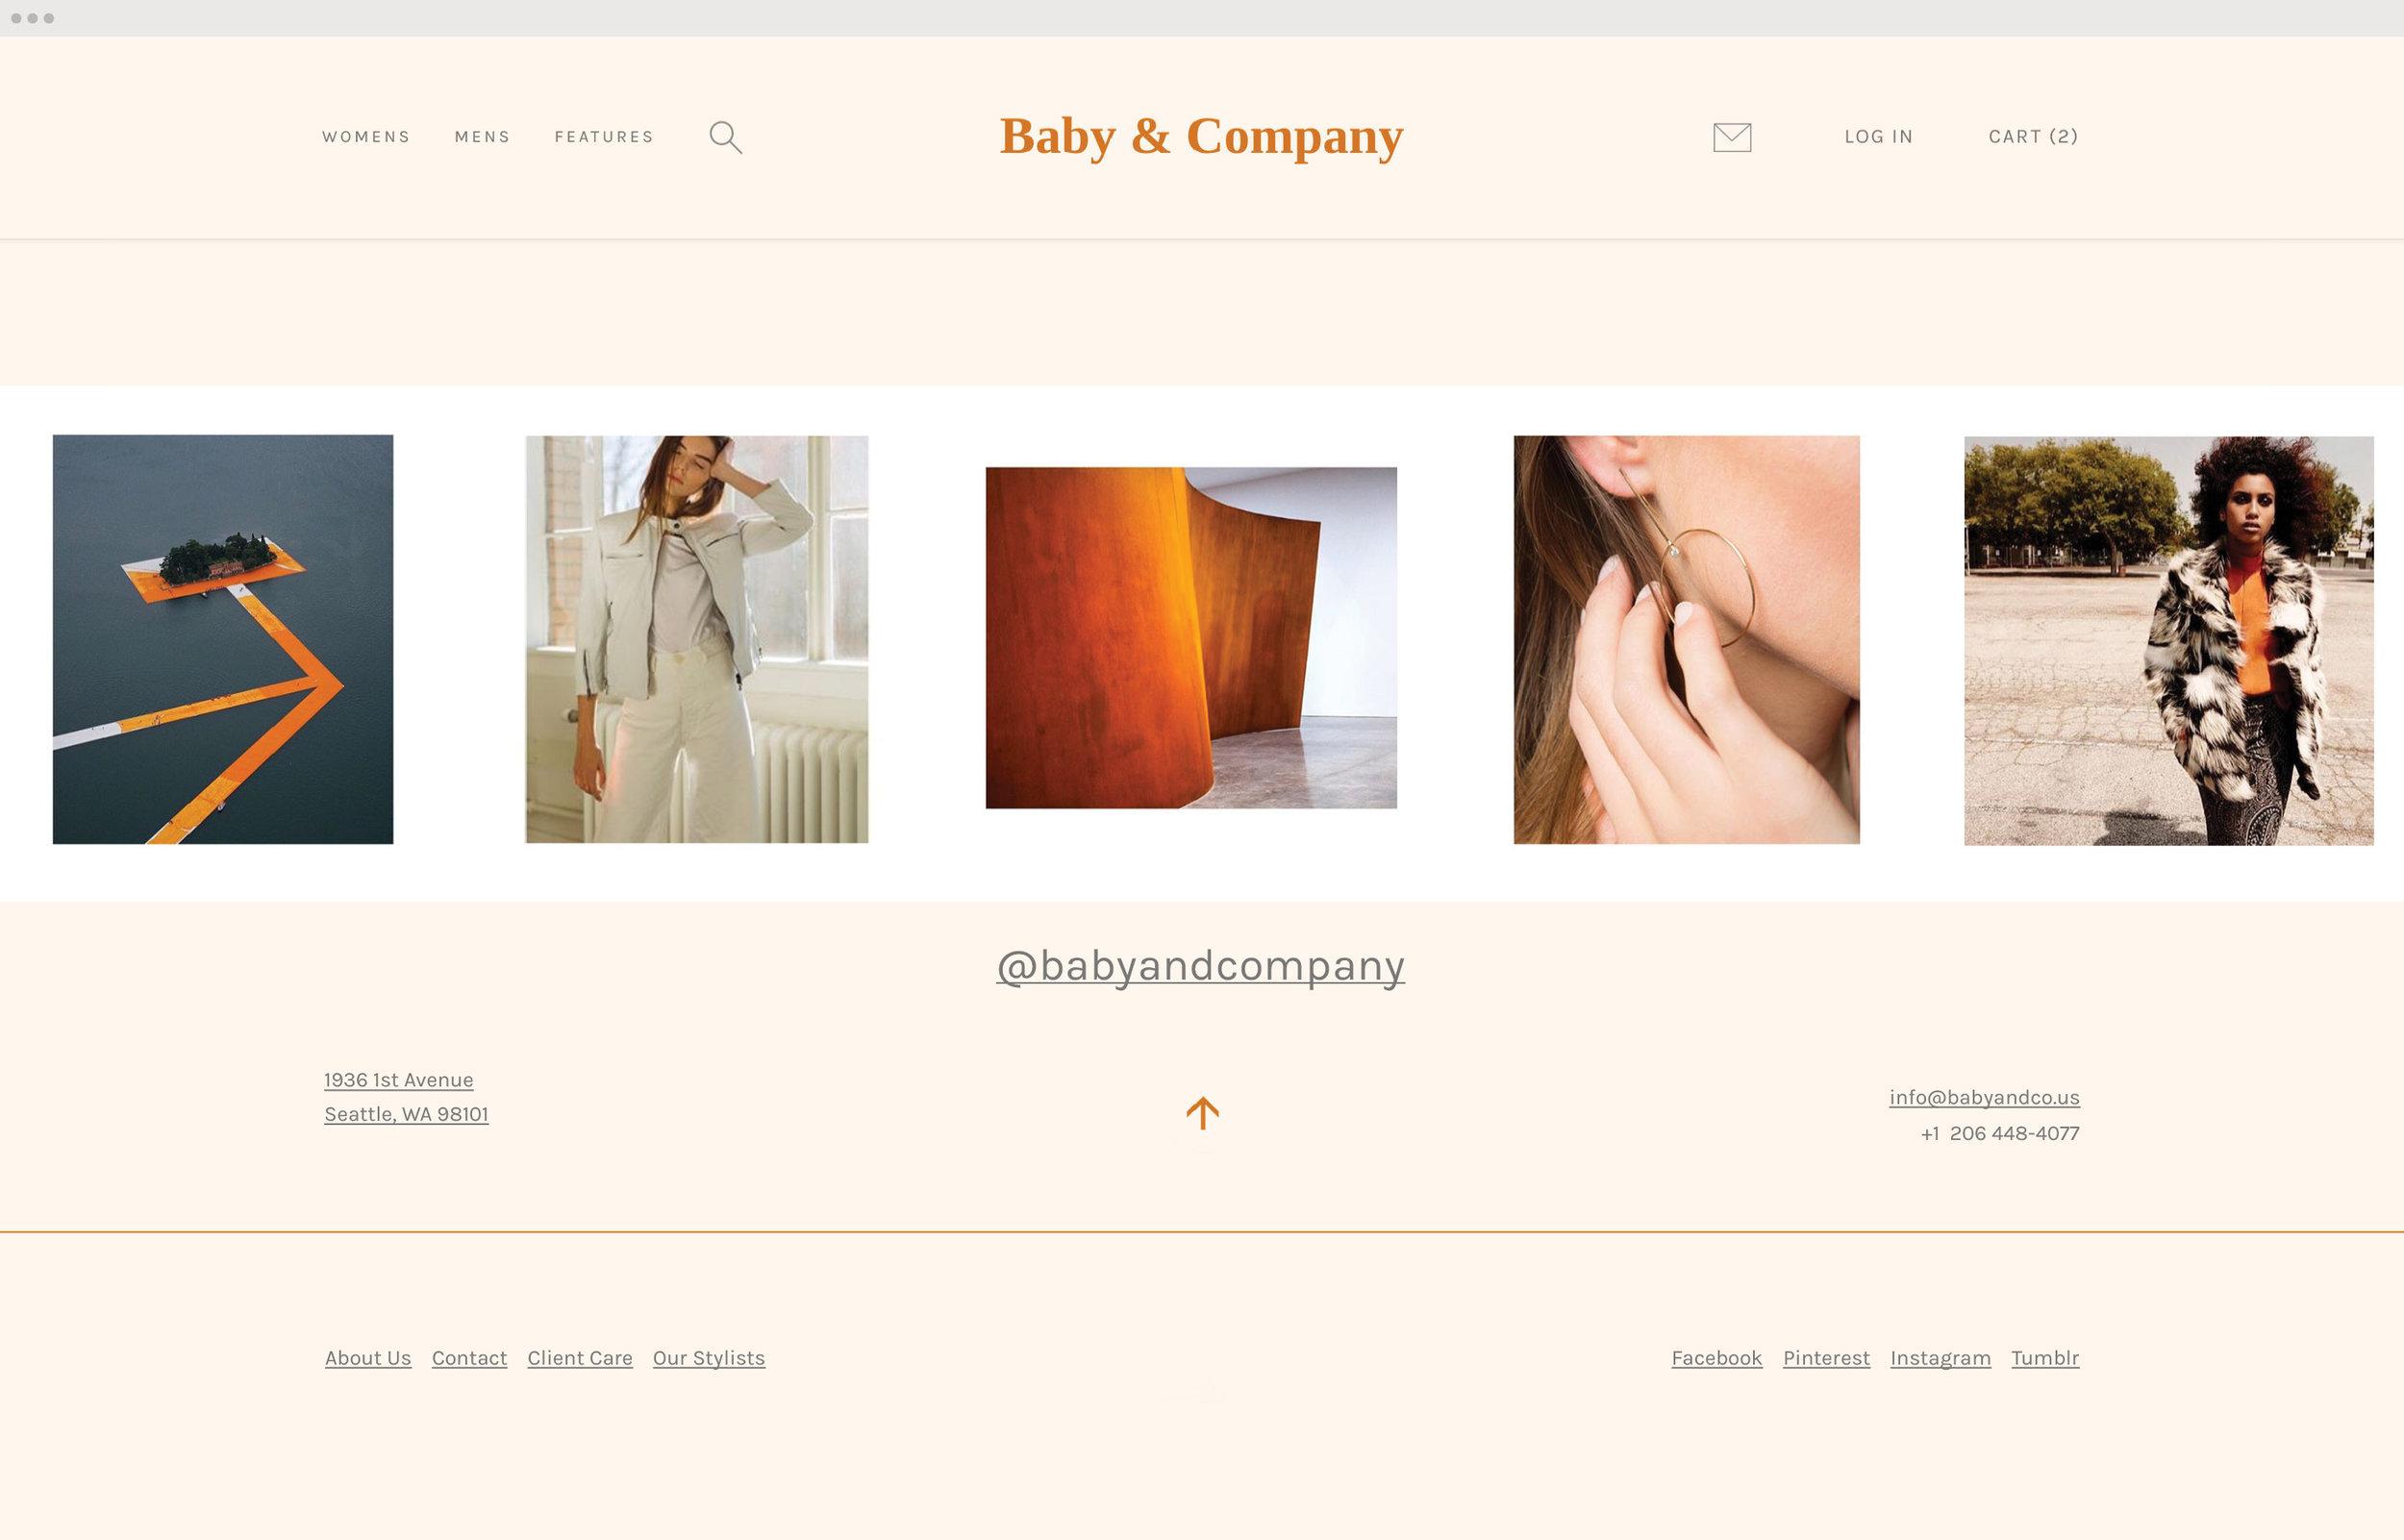 Web Tiles_2019_Web Design - B&C site customization6.jpg